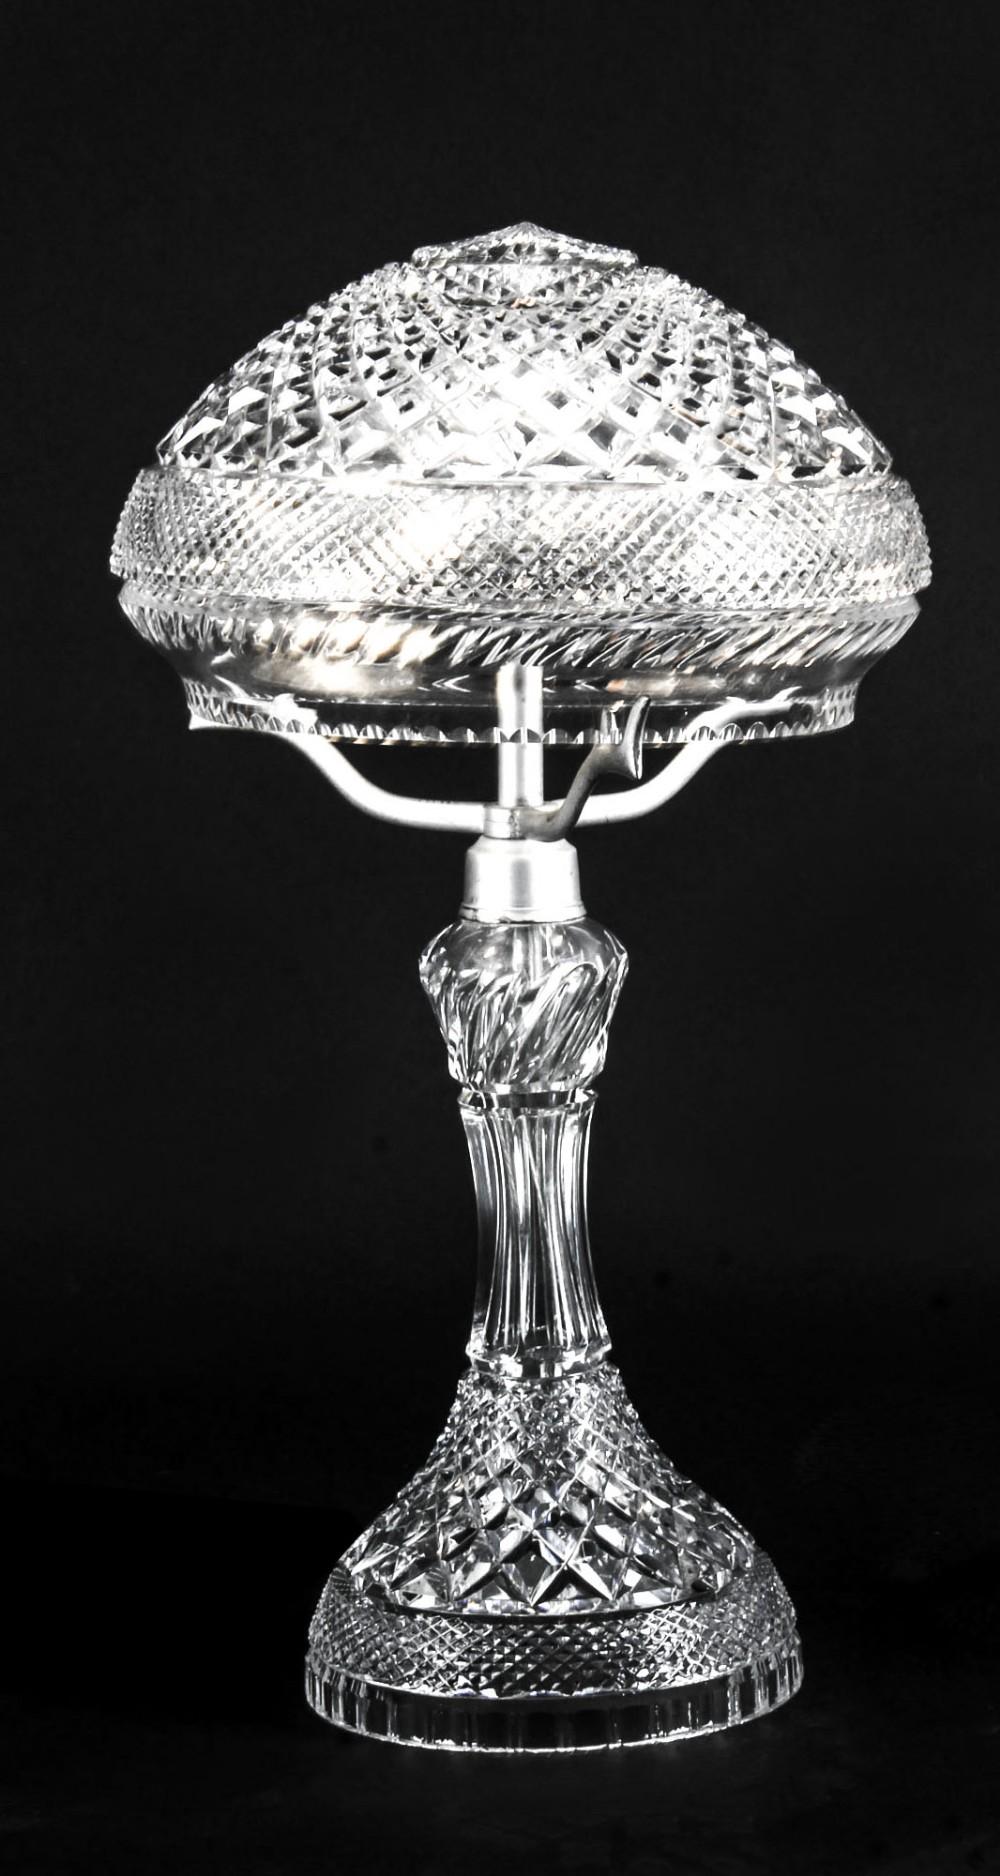 antique edwardian crystal cut glass table lamp circa 1900